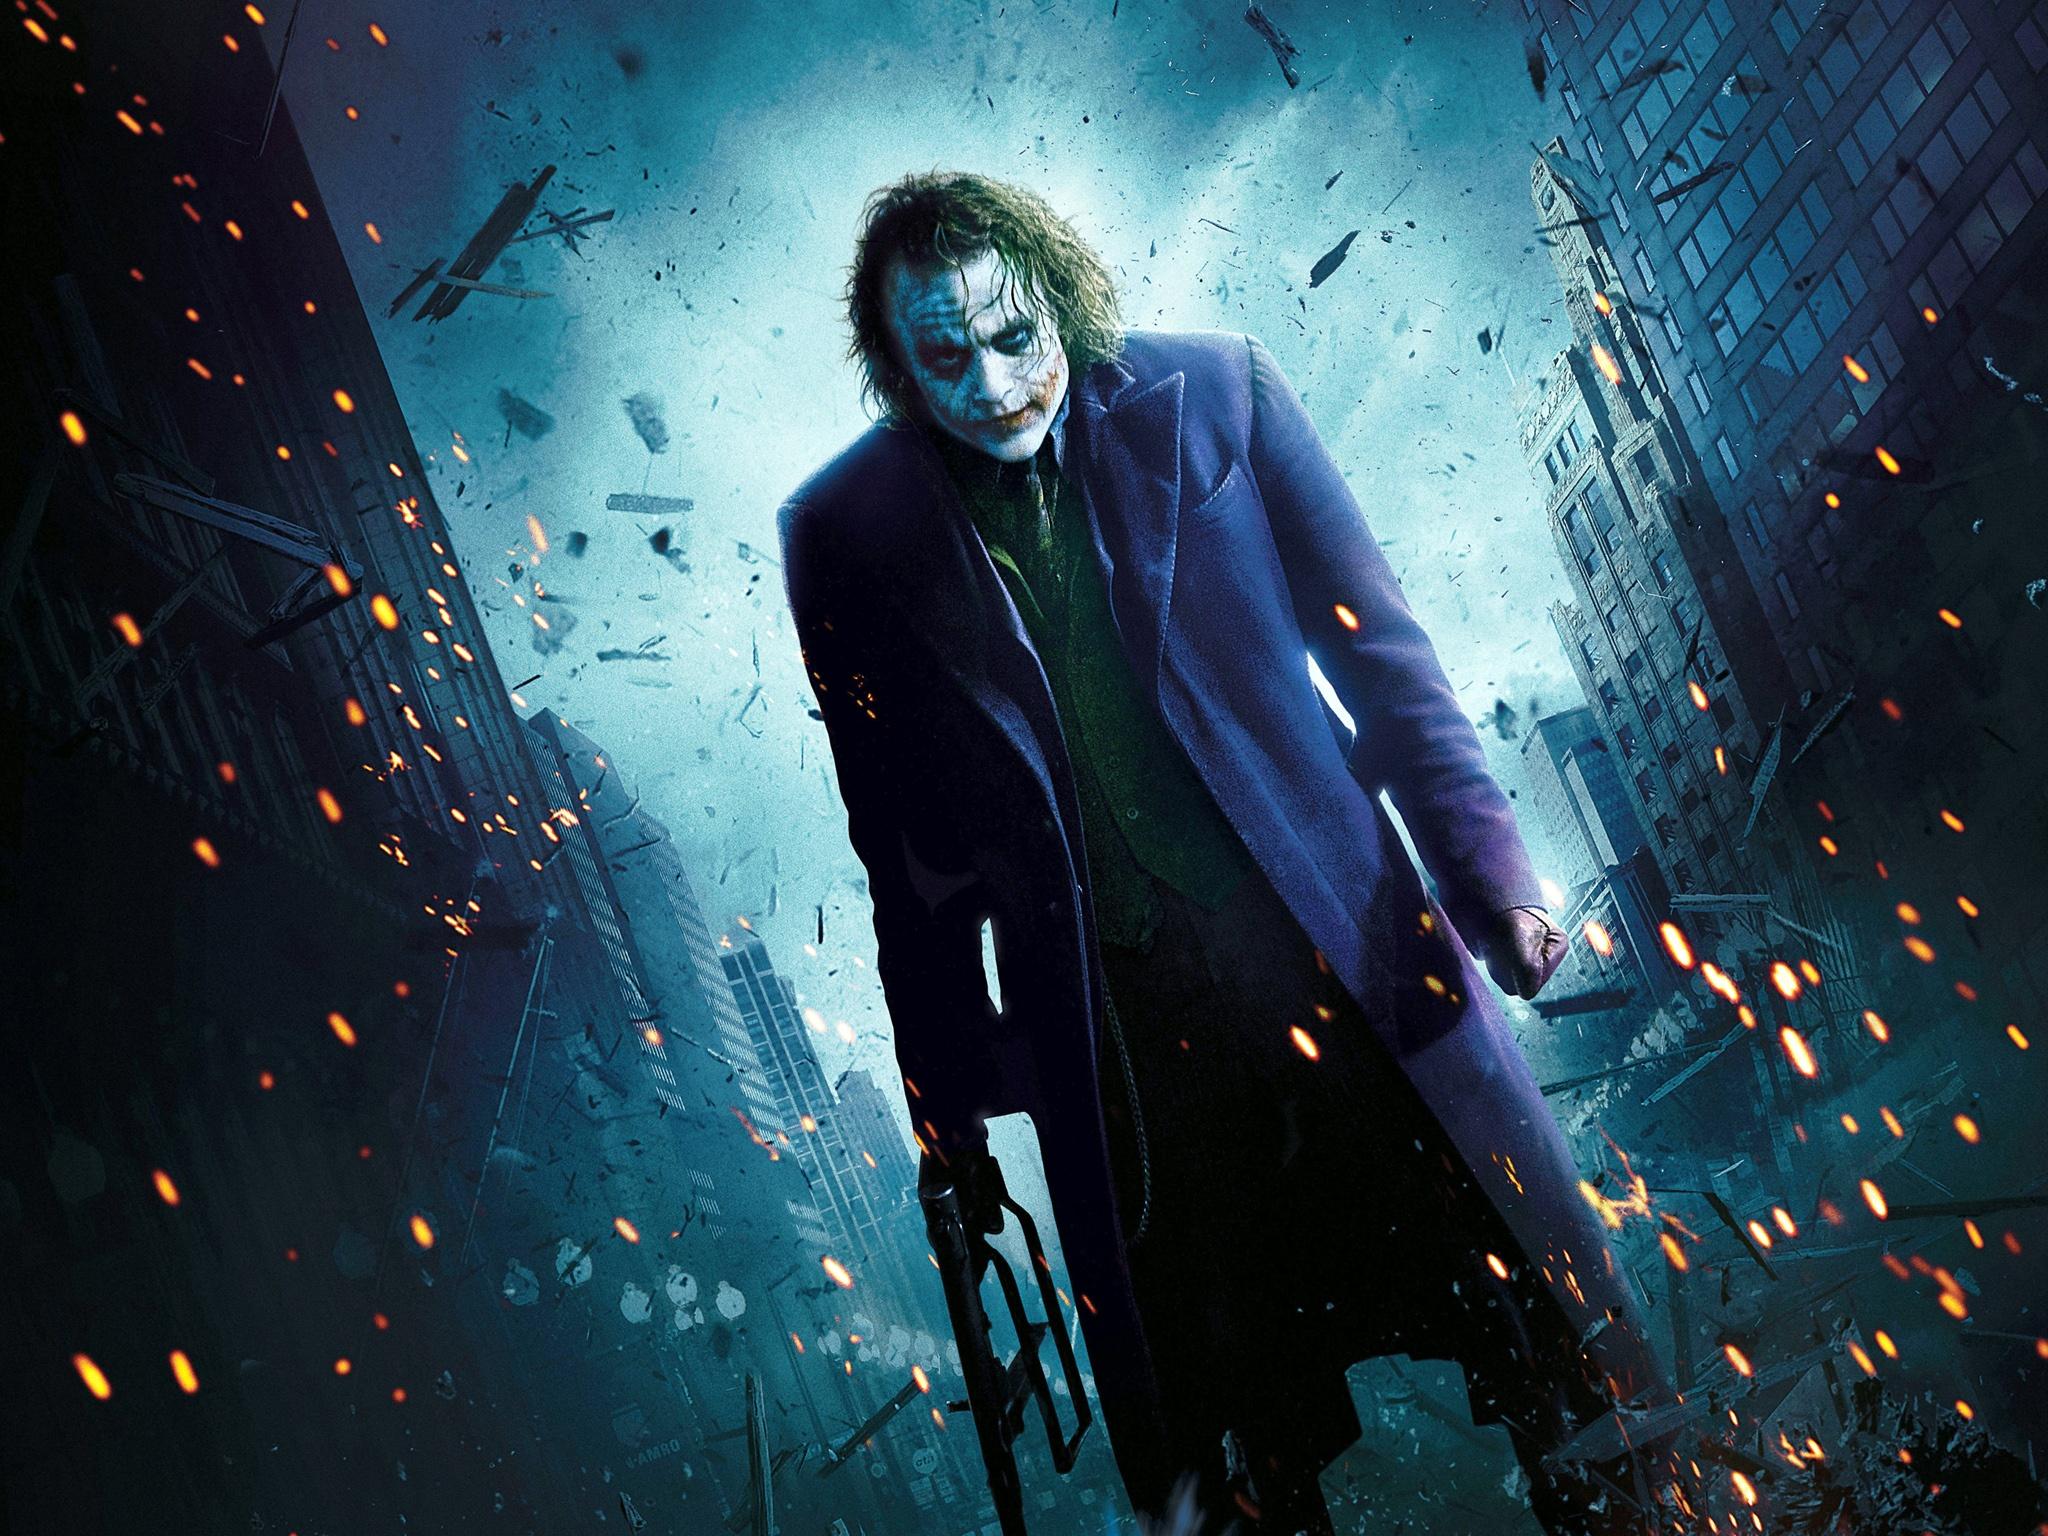 Joker Wallpapers HD Wallpapers 2048x1536